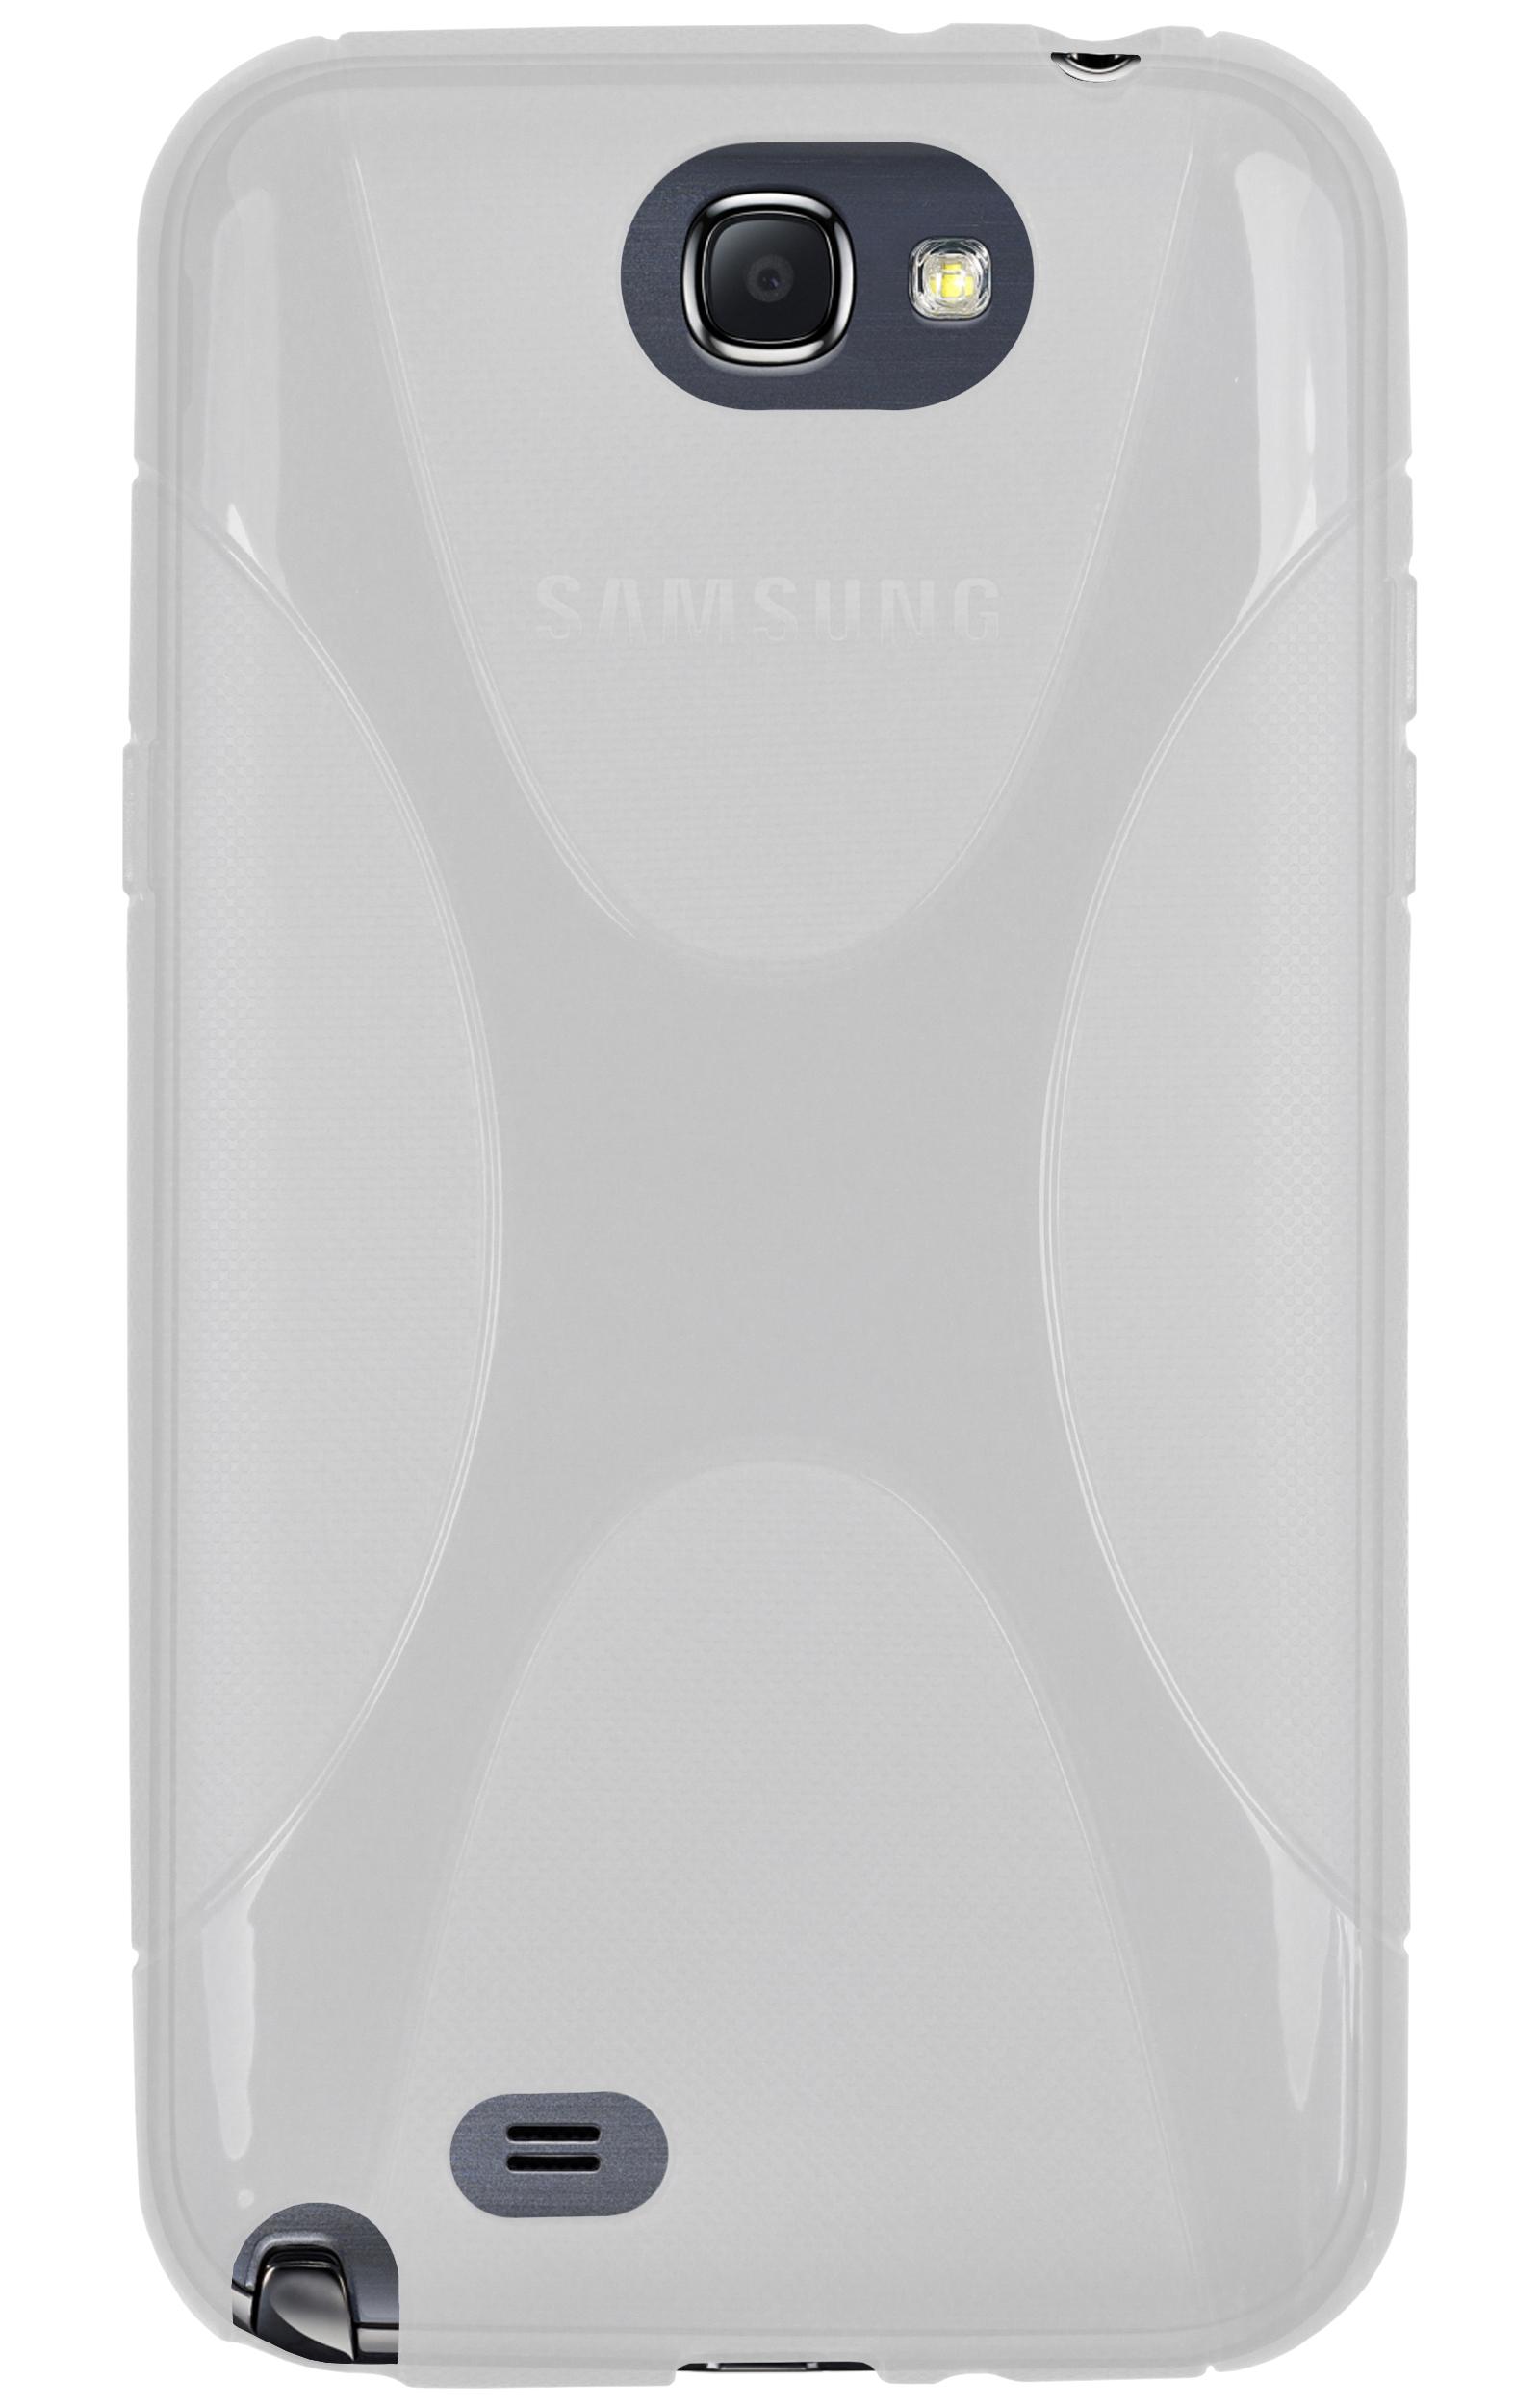 Caleffi 533241 Druckminderer 1//2 Zoll Manometer